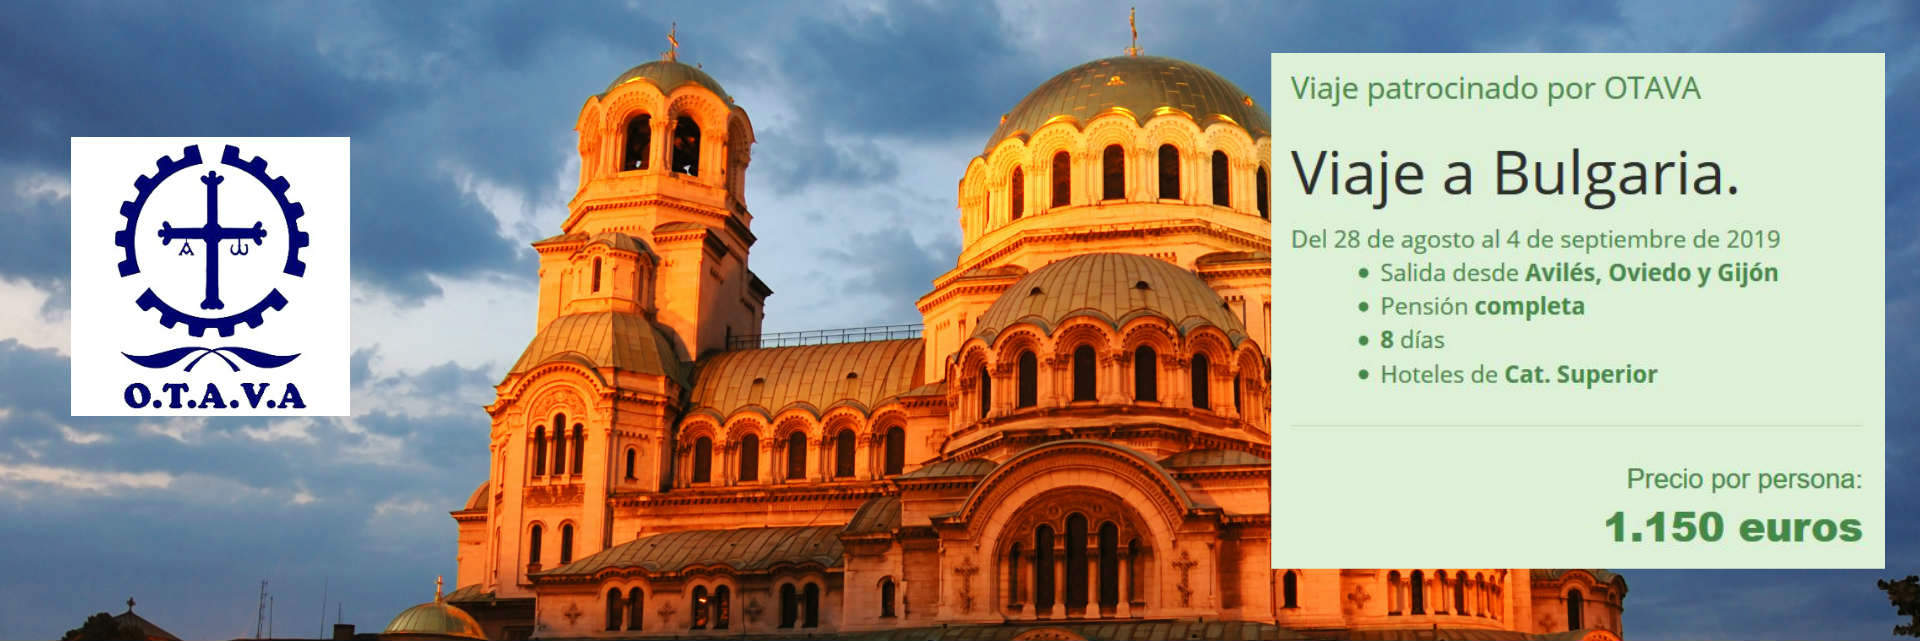 Maravillas de Bulgaria